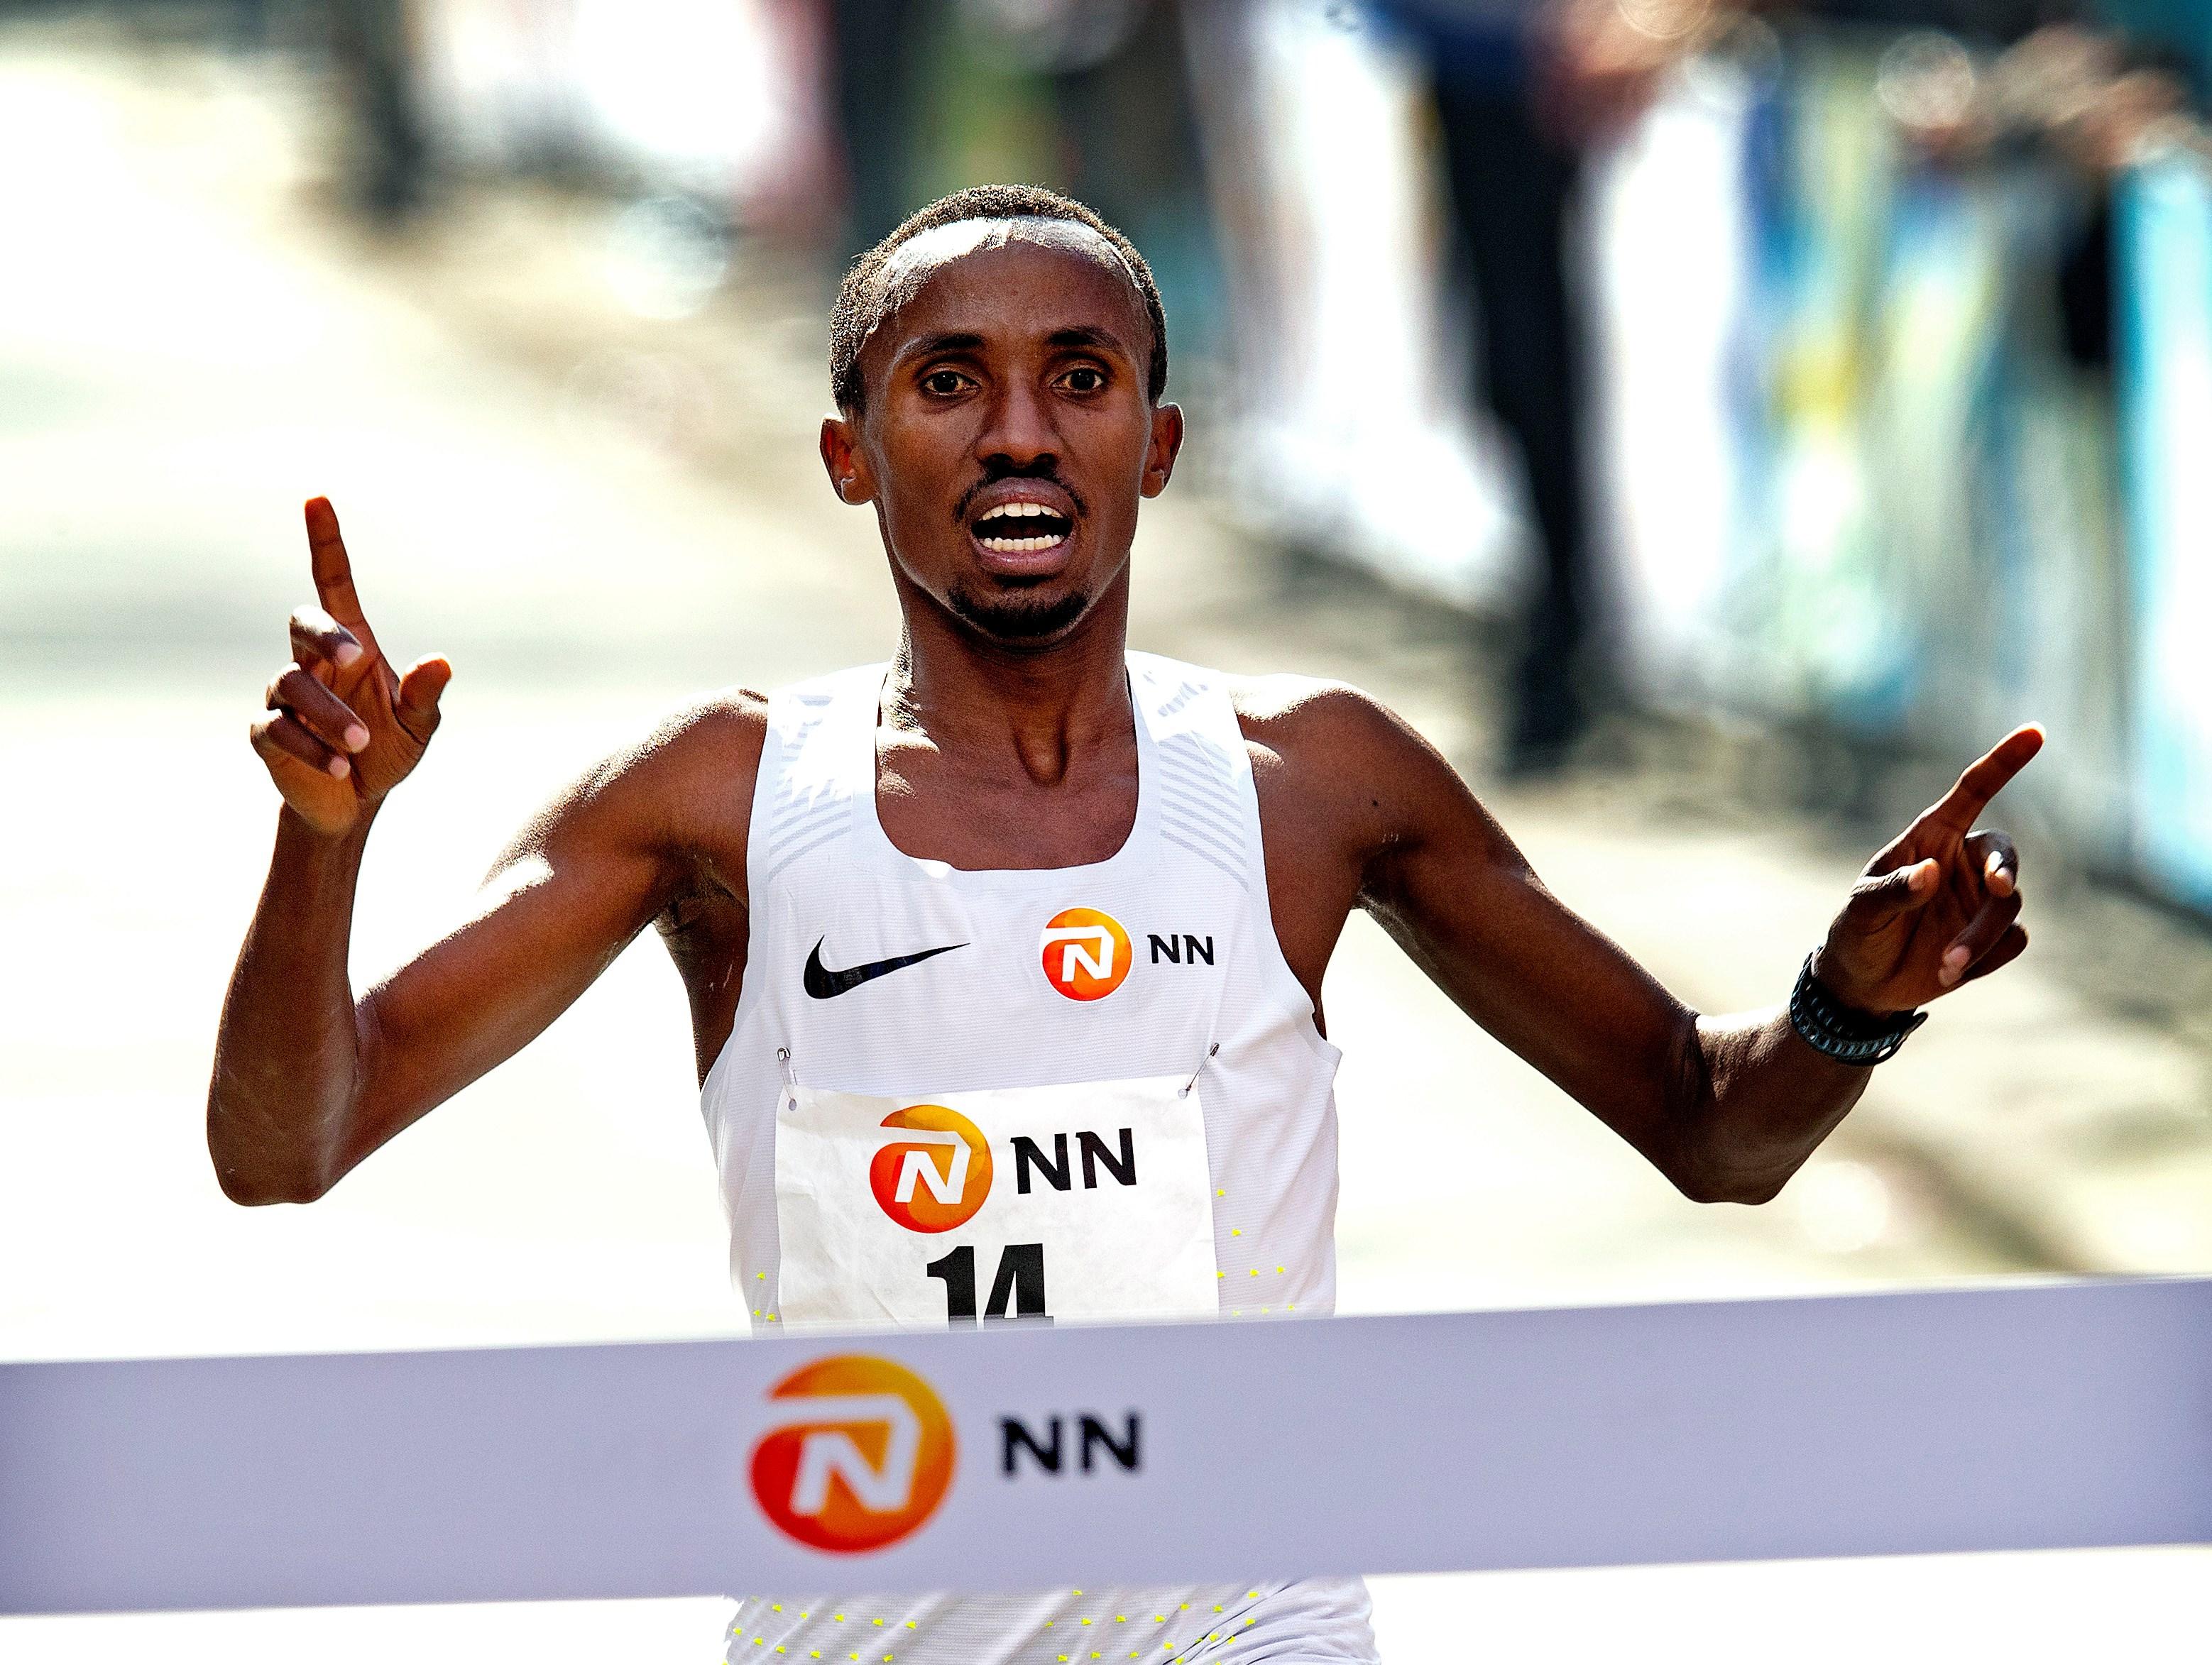 Nederlands recordhouder Abdi Nageeye aan de start van 39e NN Marathon Rotterdam